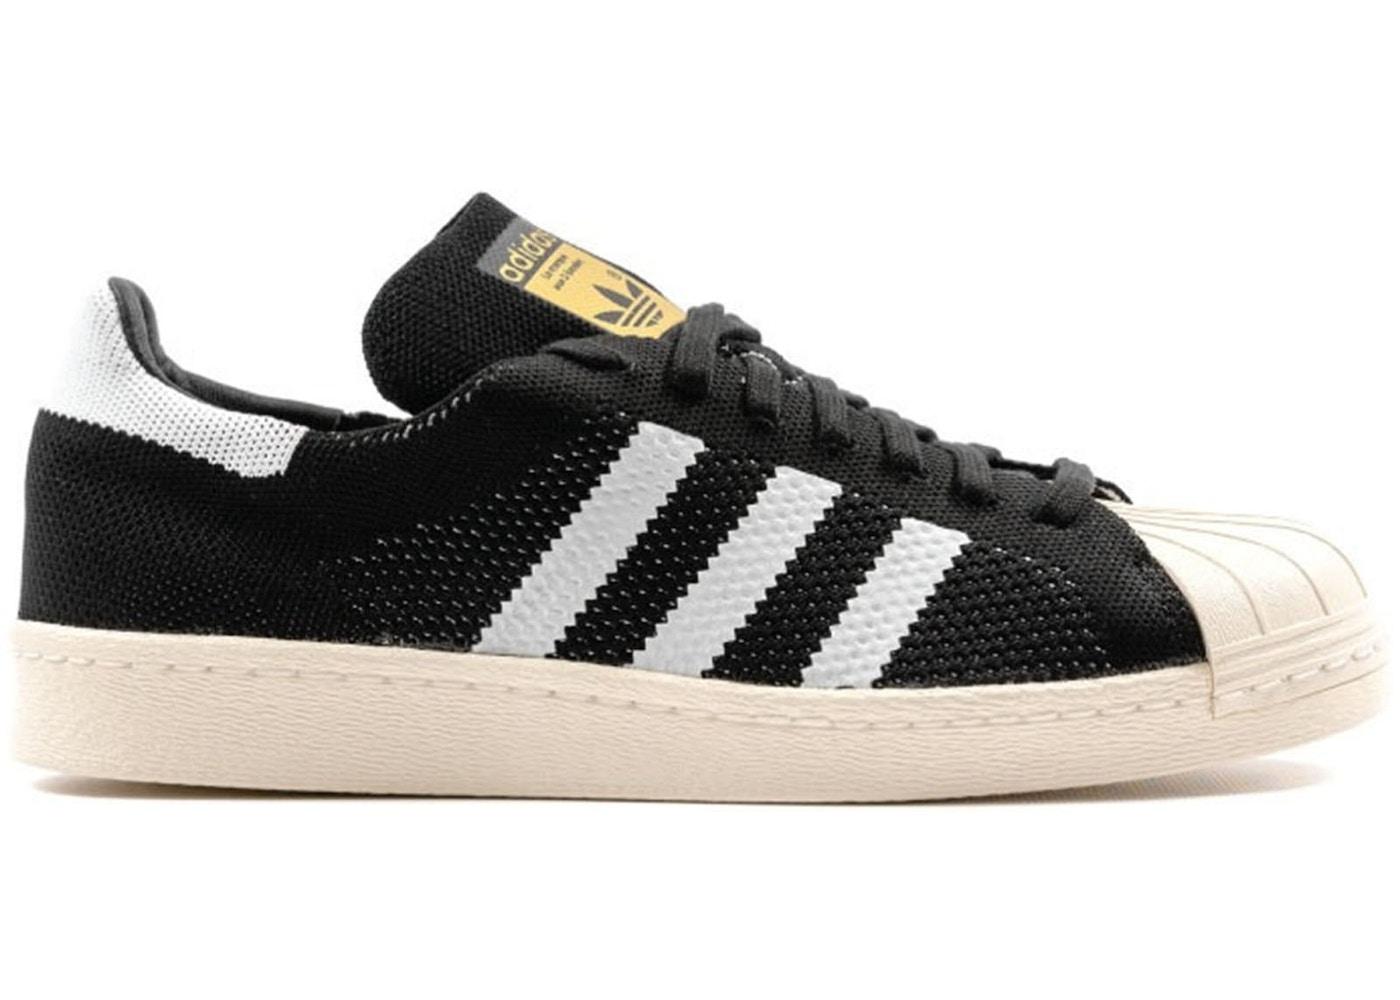 adidas Superstar 80s Primeknit Black White - S77439